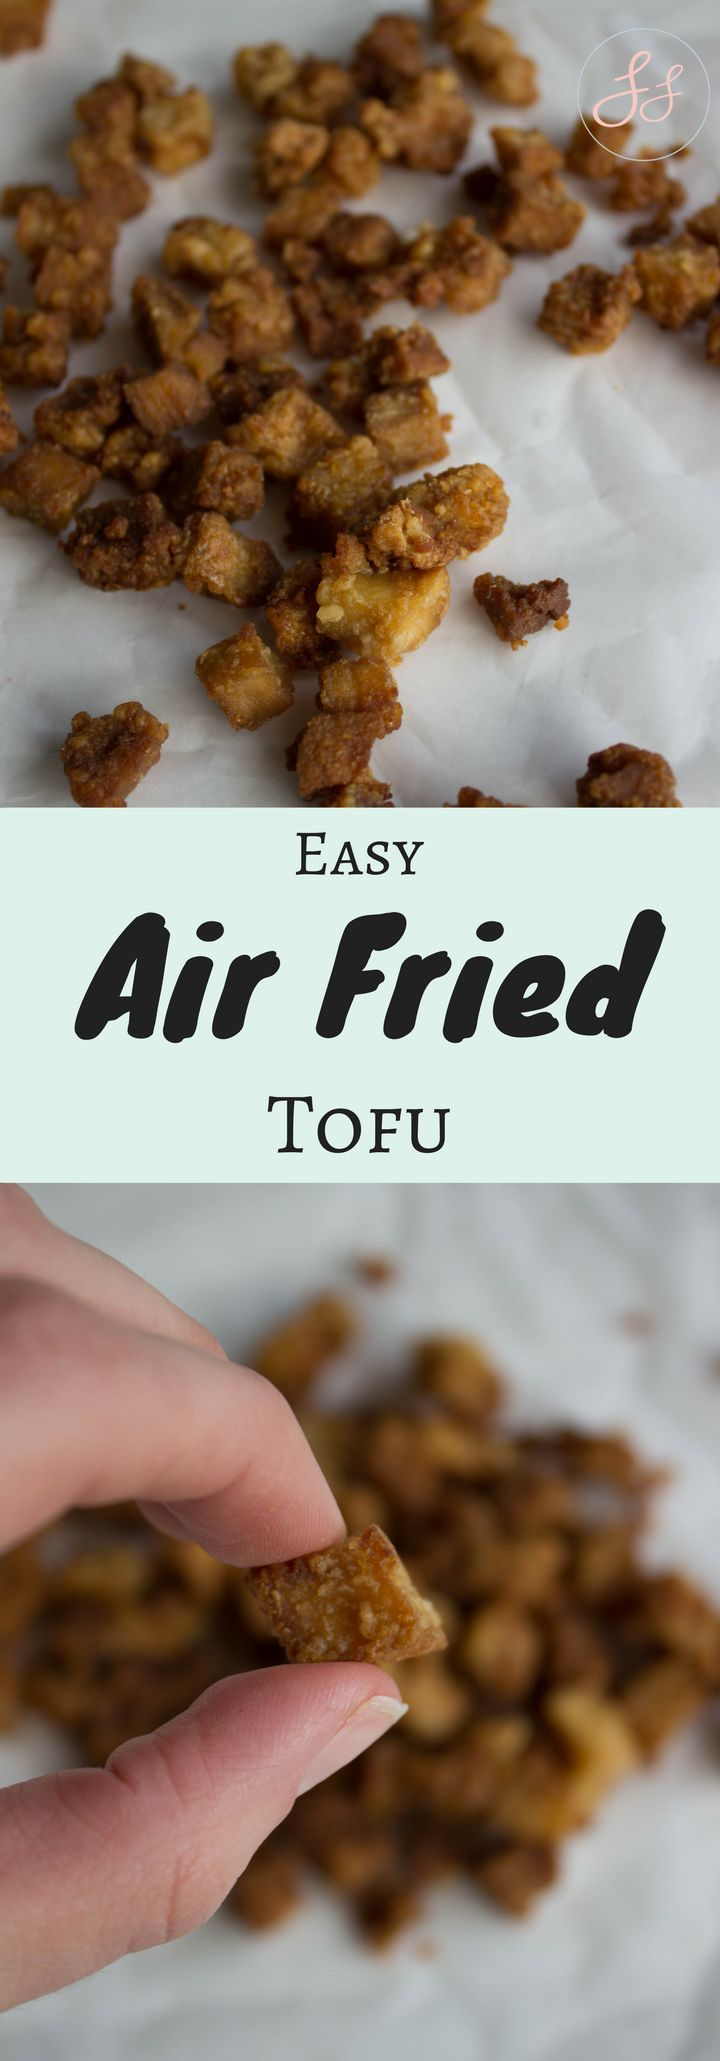 Easy Air Fried Tofu Recipe Food, Vegan dishes, Tofu